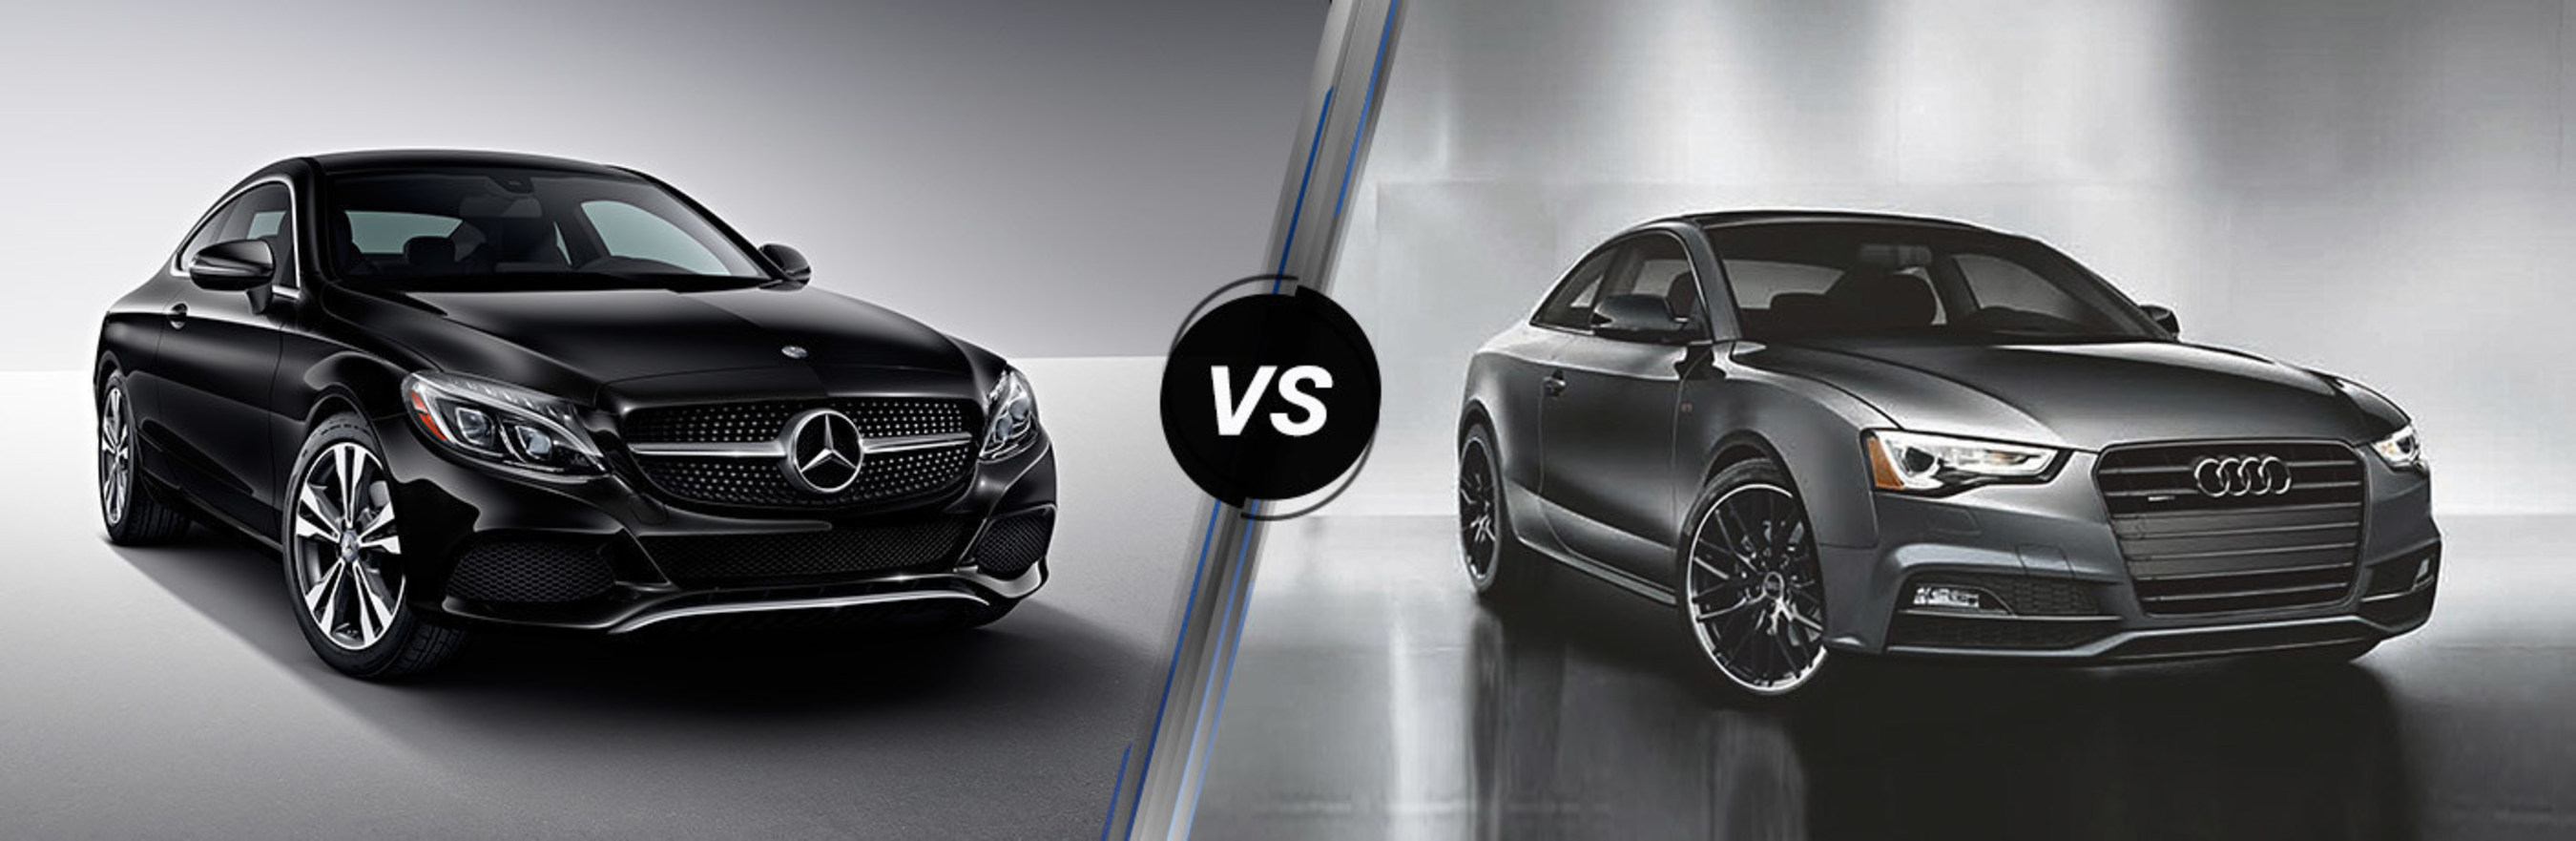 Sporty luxury vehicles showcased in latest Loeber Motors comparison